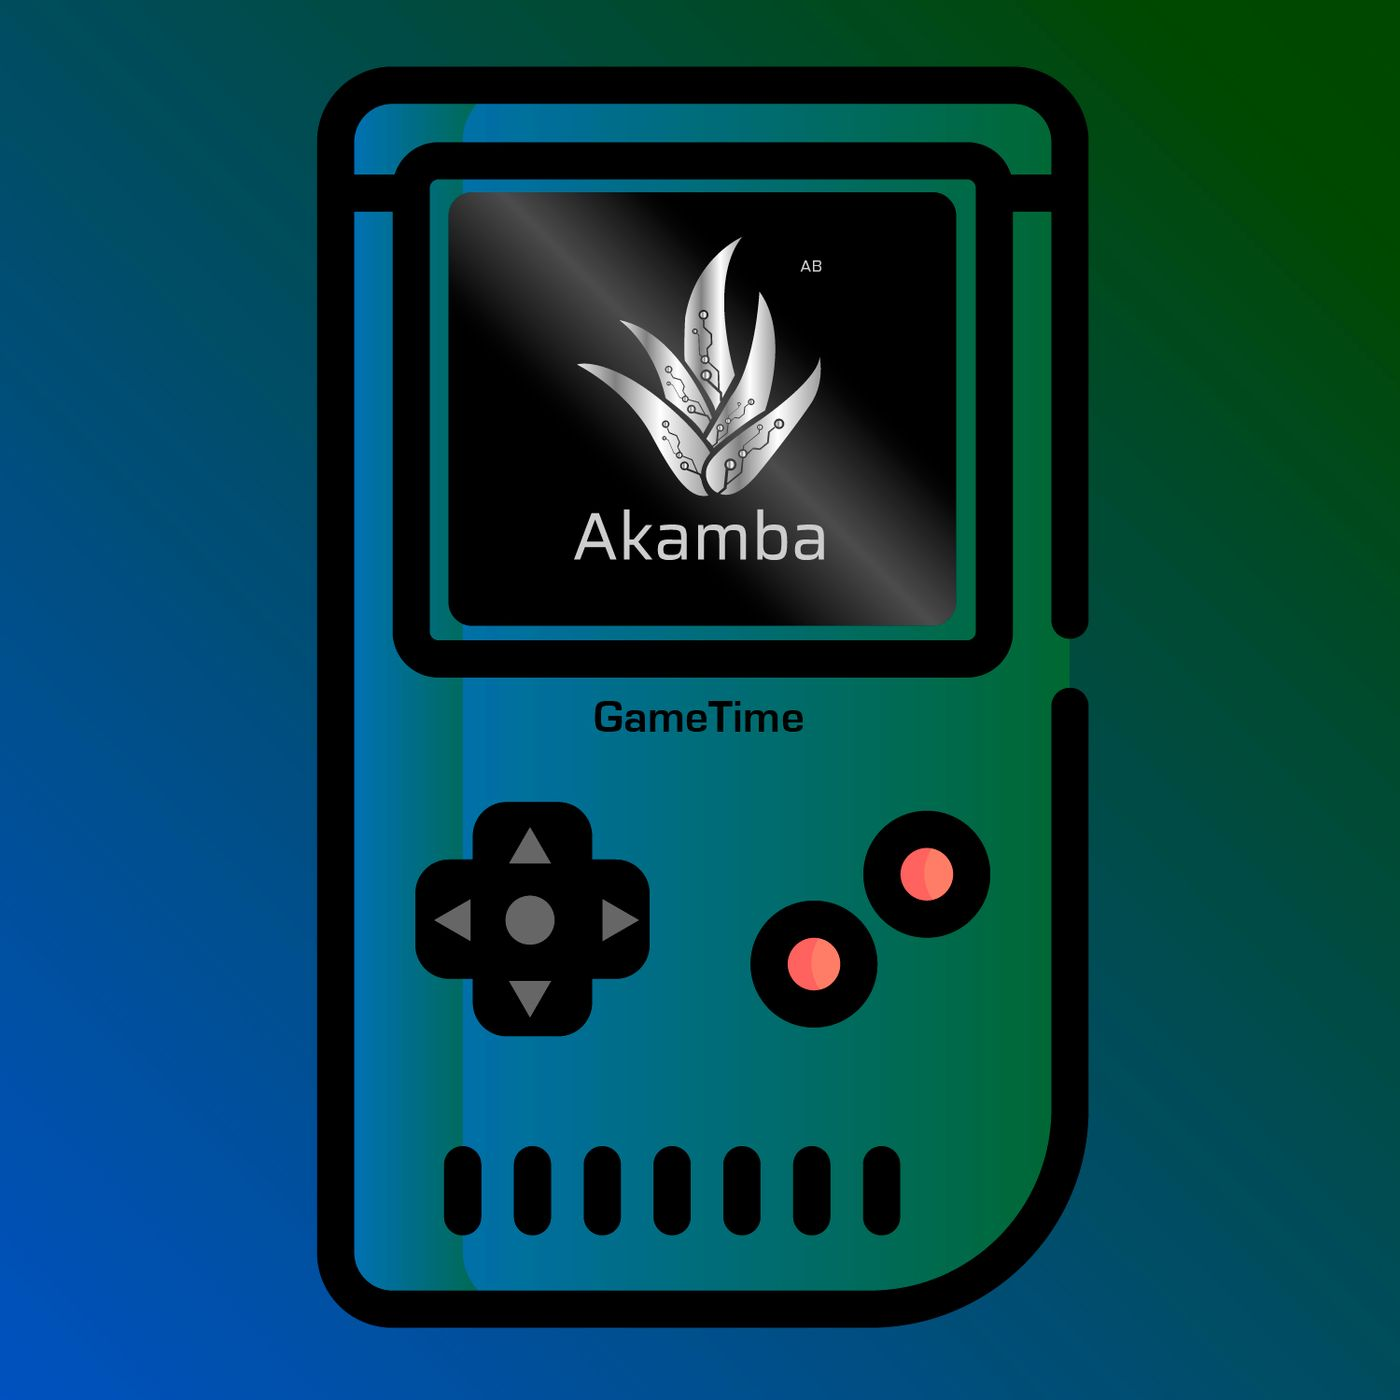 AkambaBits - GameTime